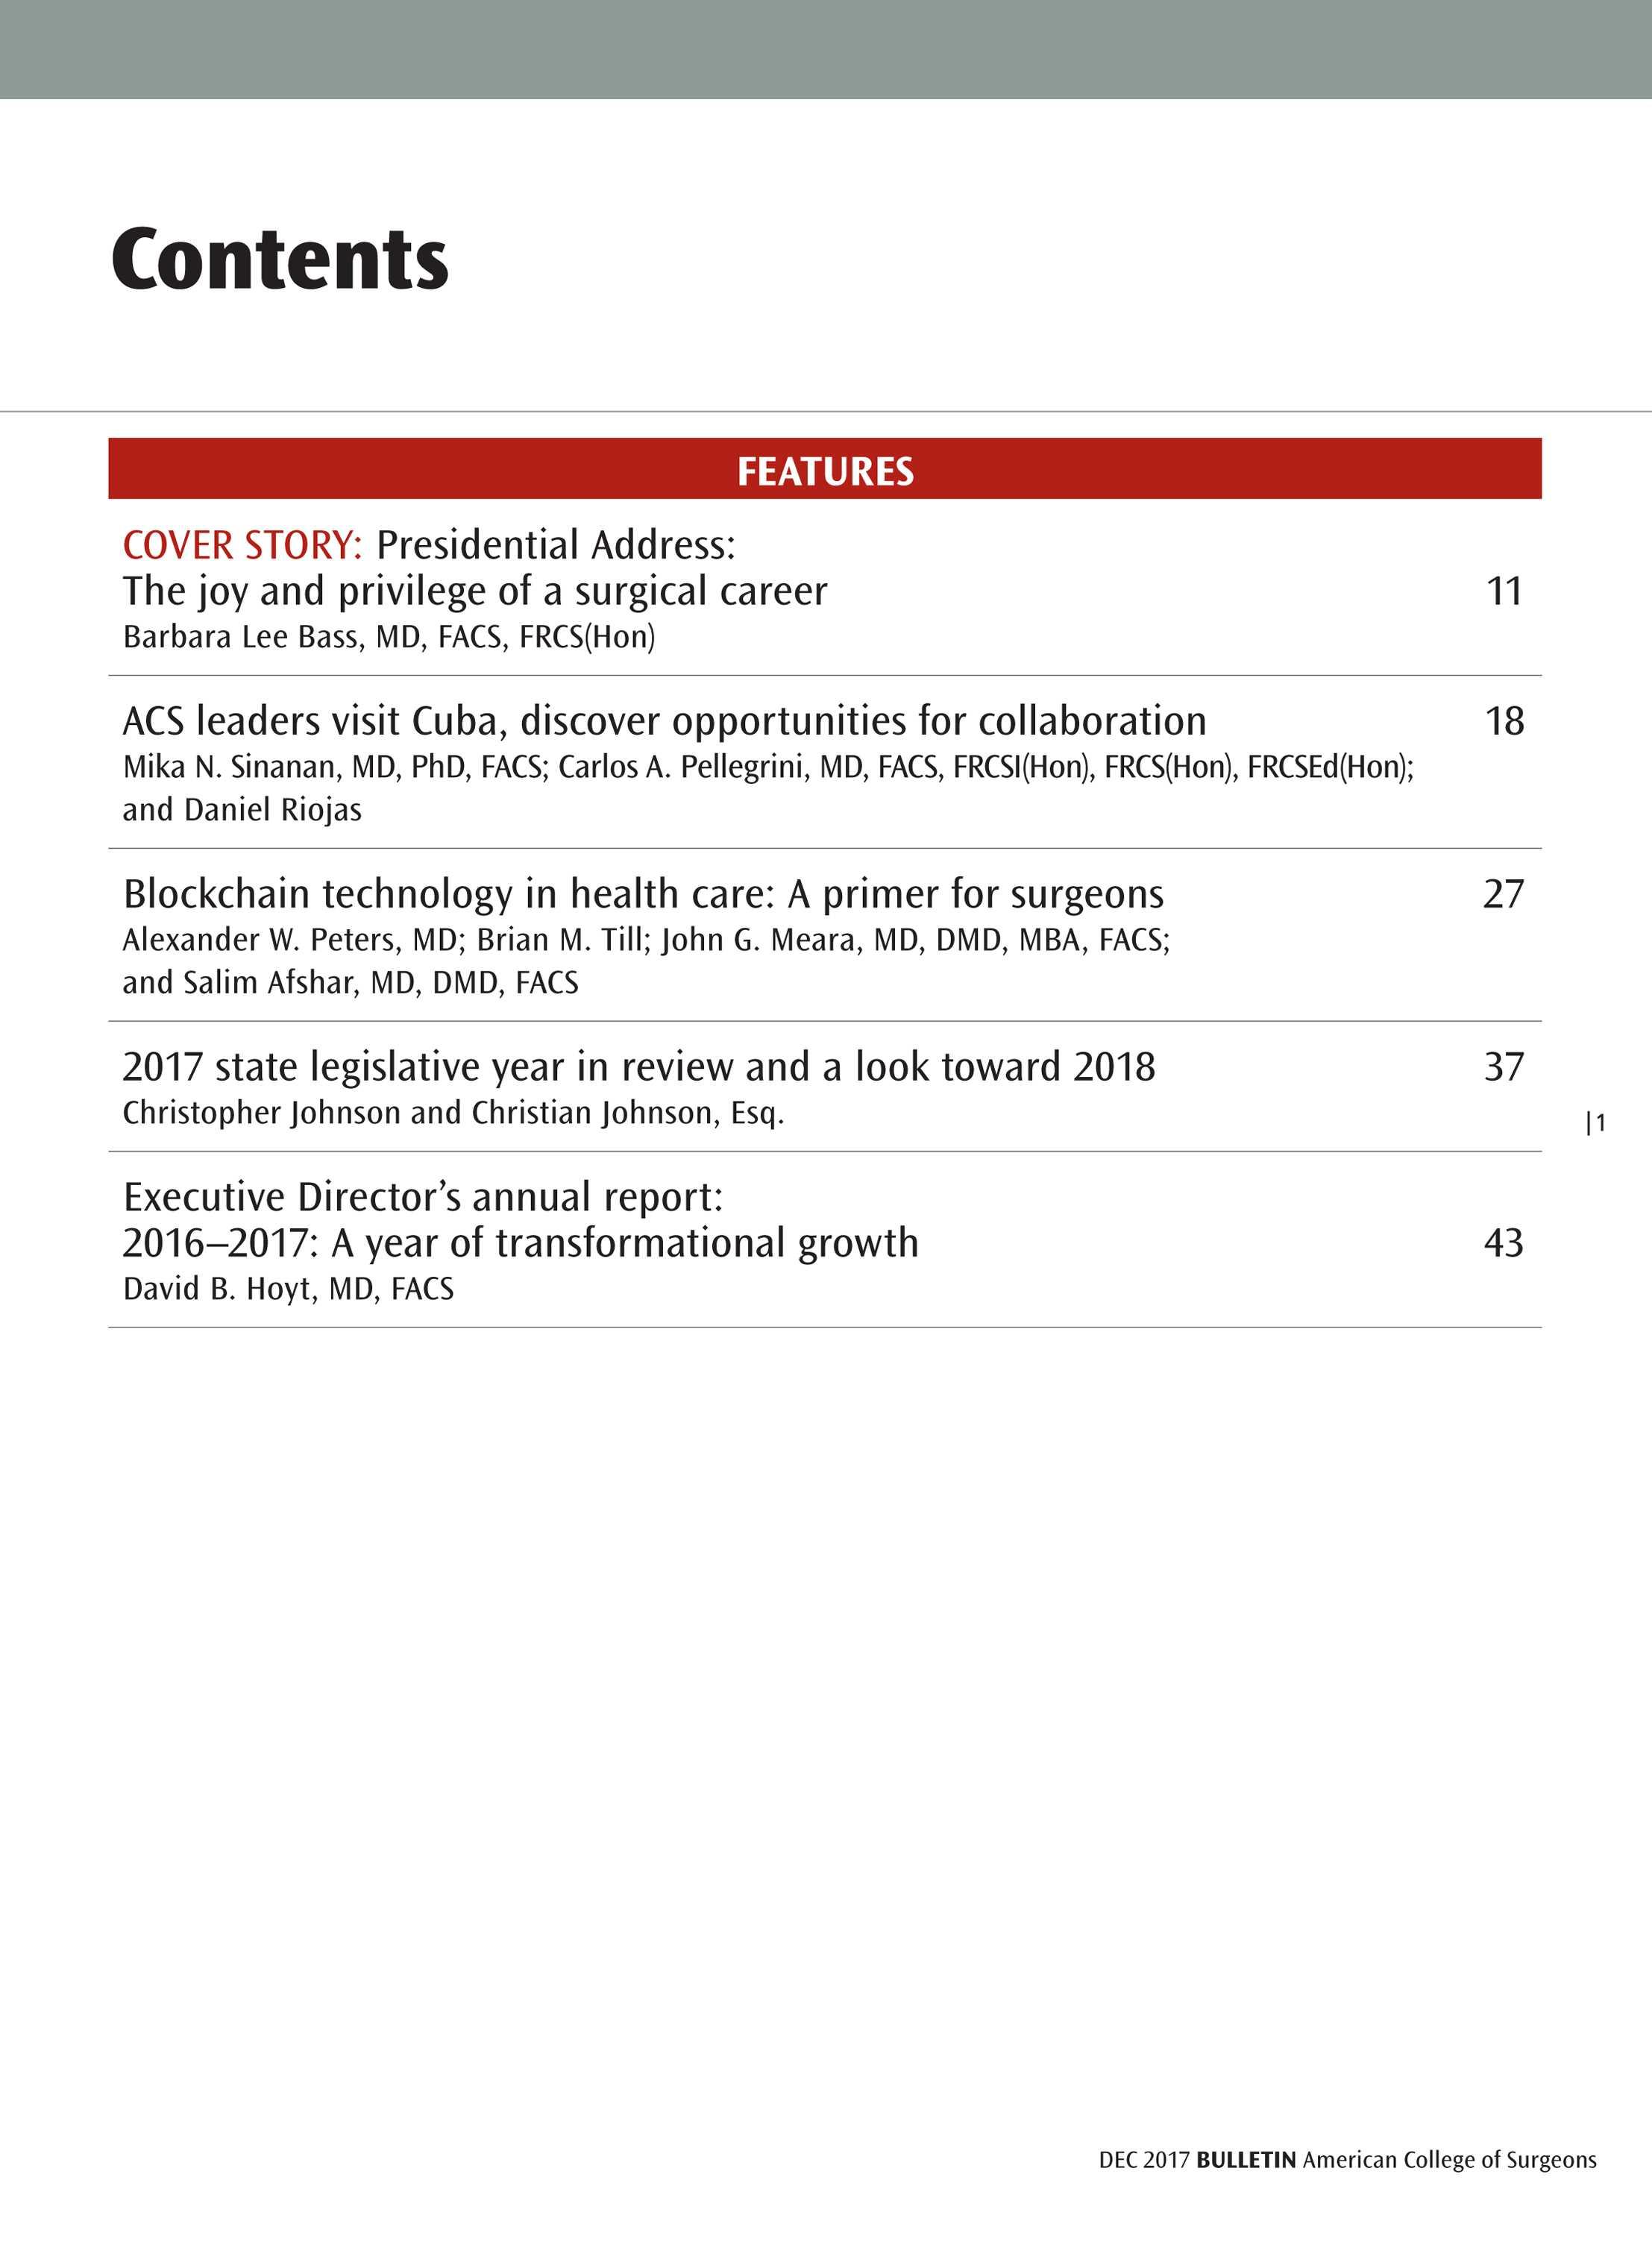 ACS Bulletin - December 2017 - page 1